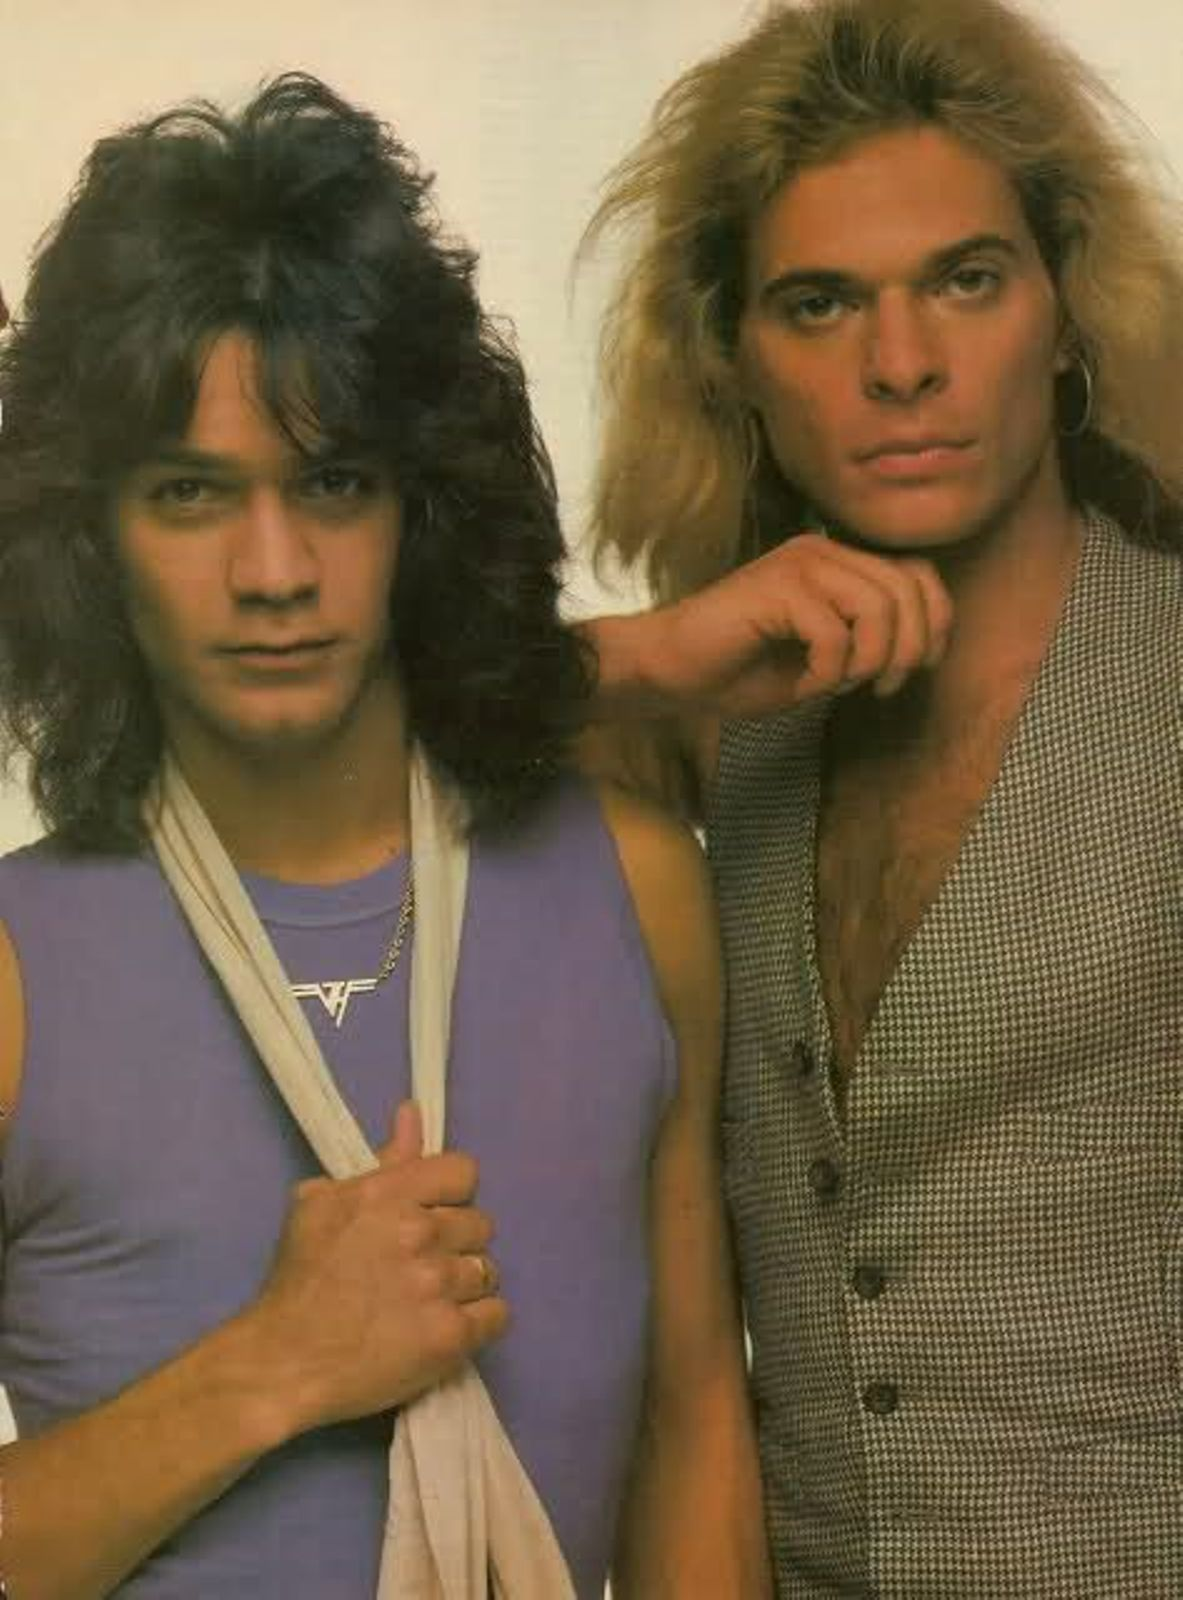 Edward Vh And David Lee Roth Estrelas Do Rock Zakk Wilde Musica